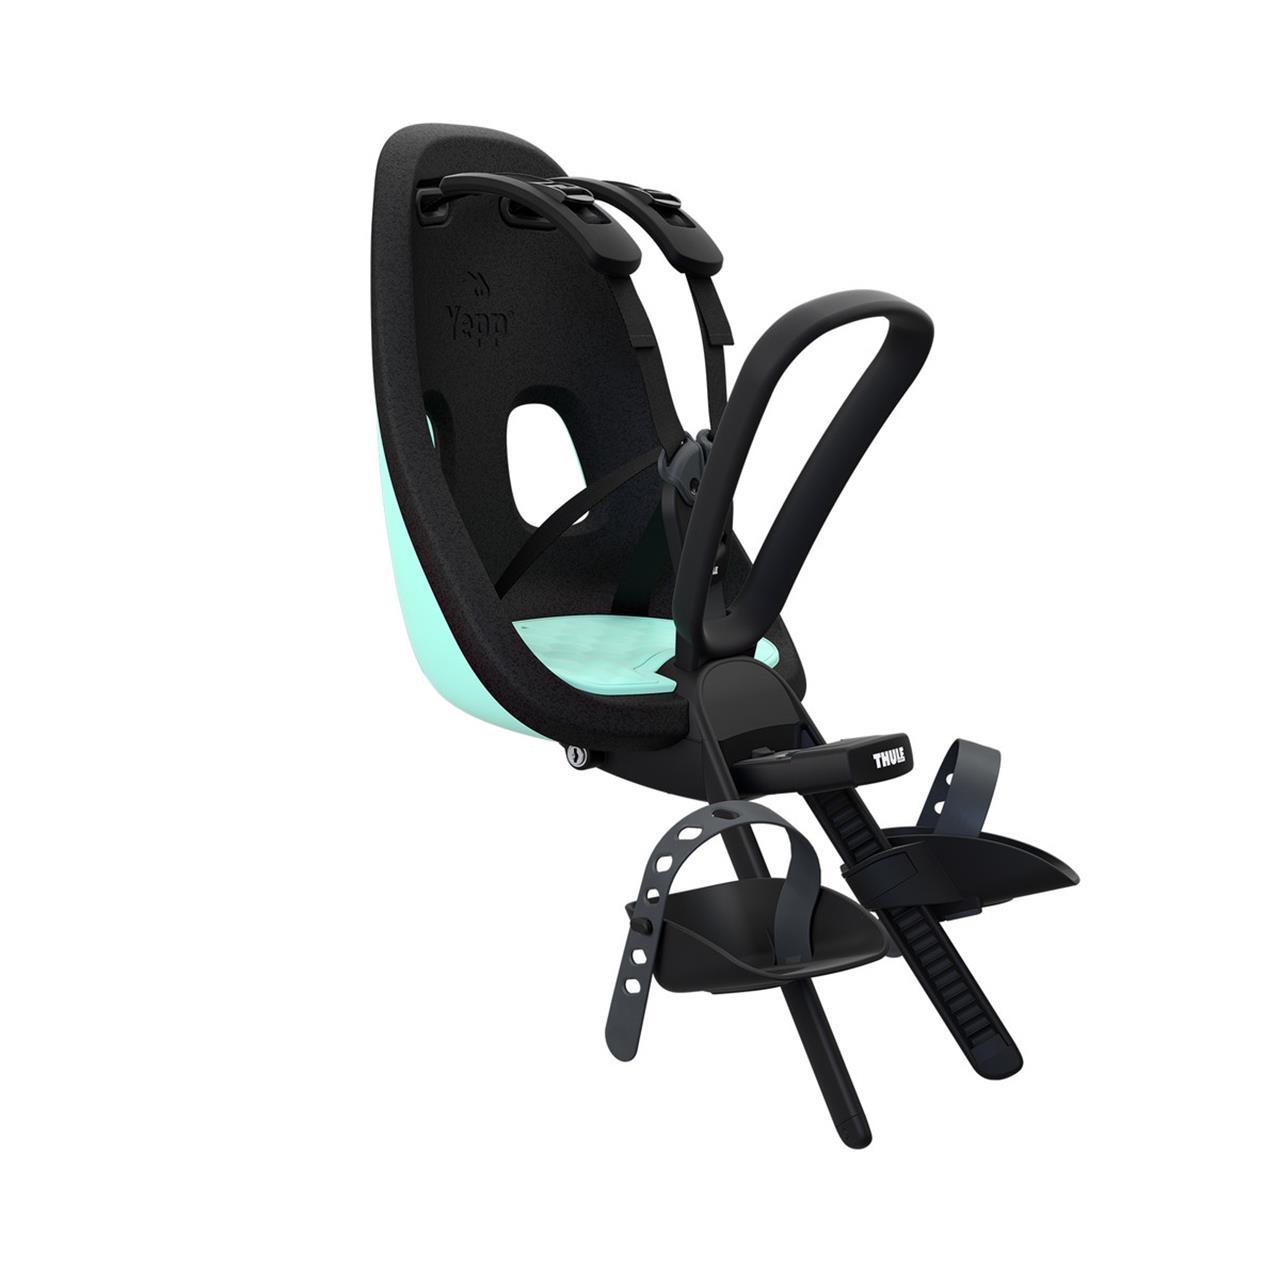 Scaun pentru copii, cu montare pe bicicleta in fata - Thule Yepp Nexxt Mini MINT GREEN imagine